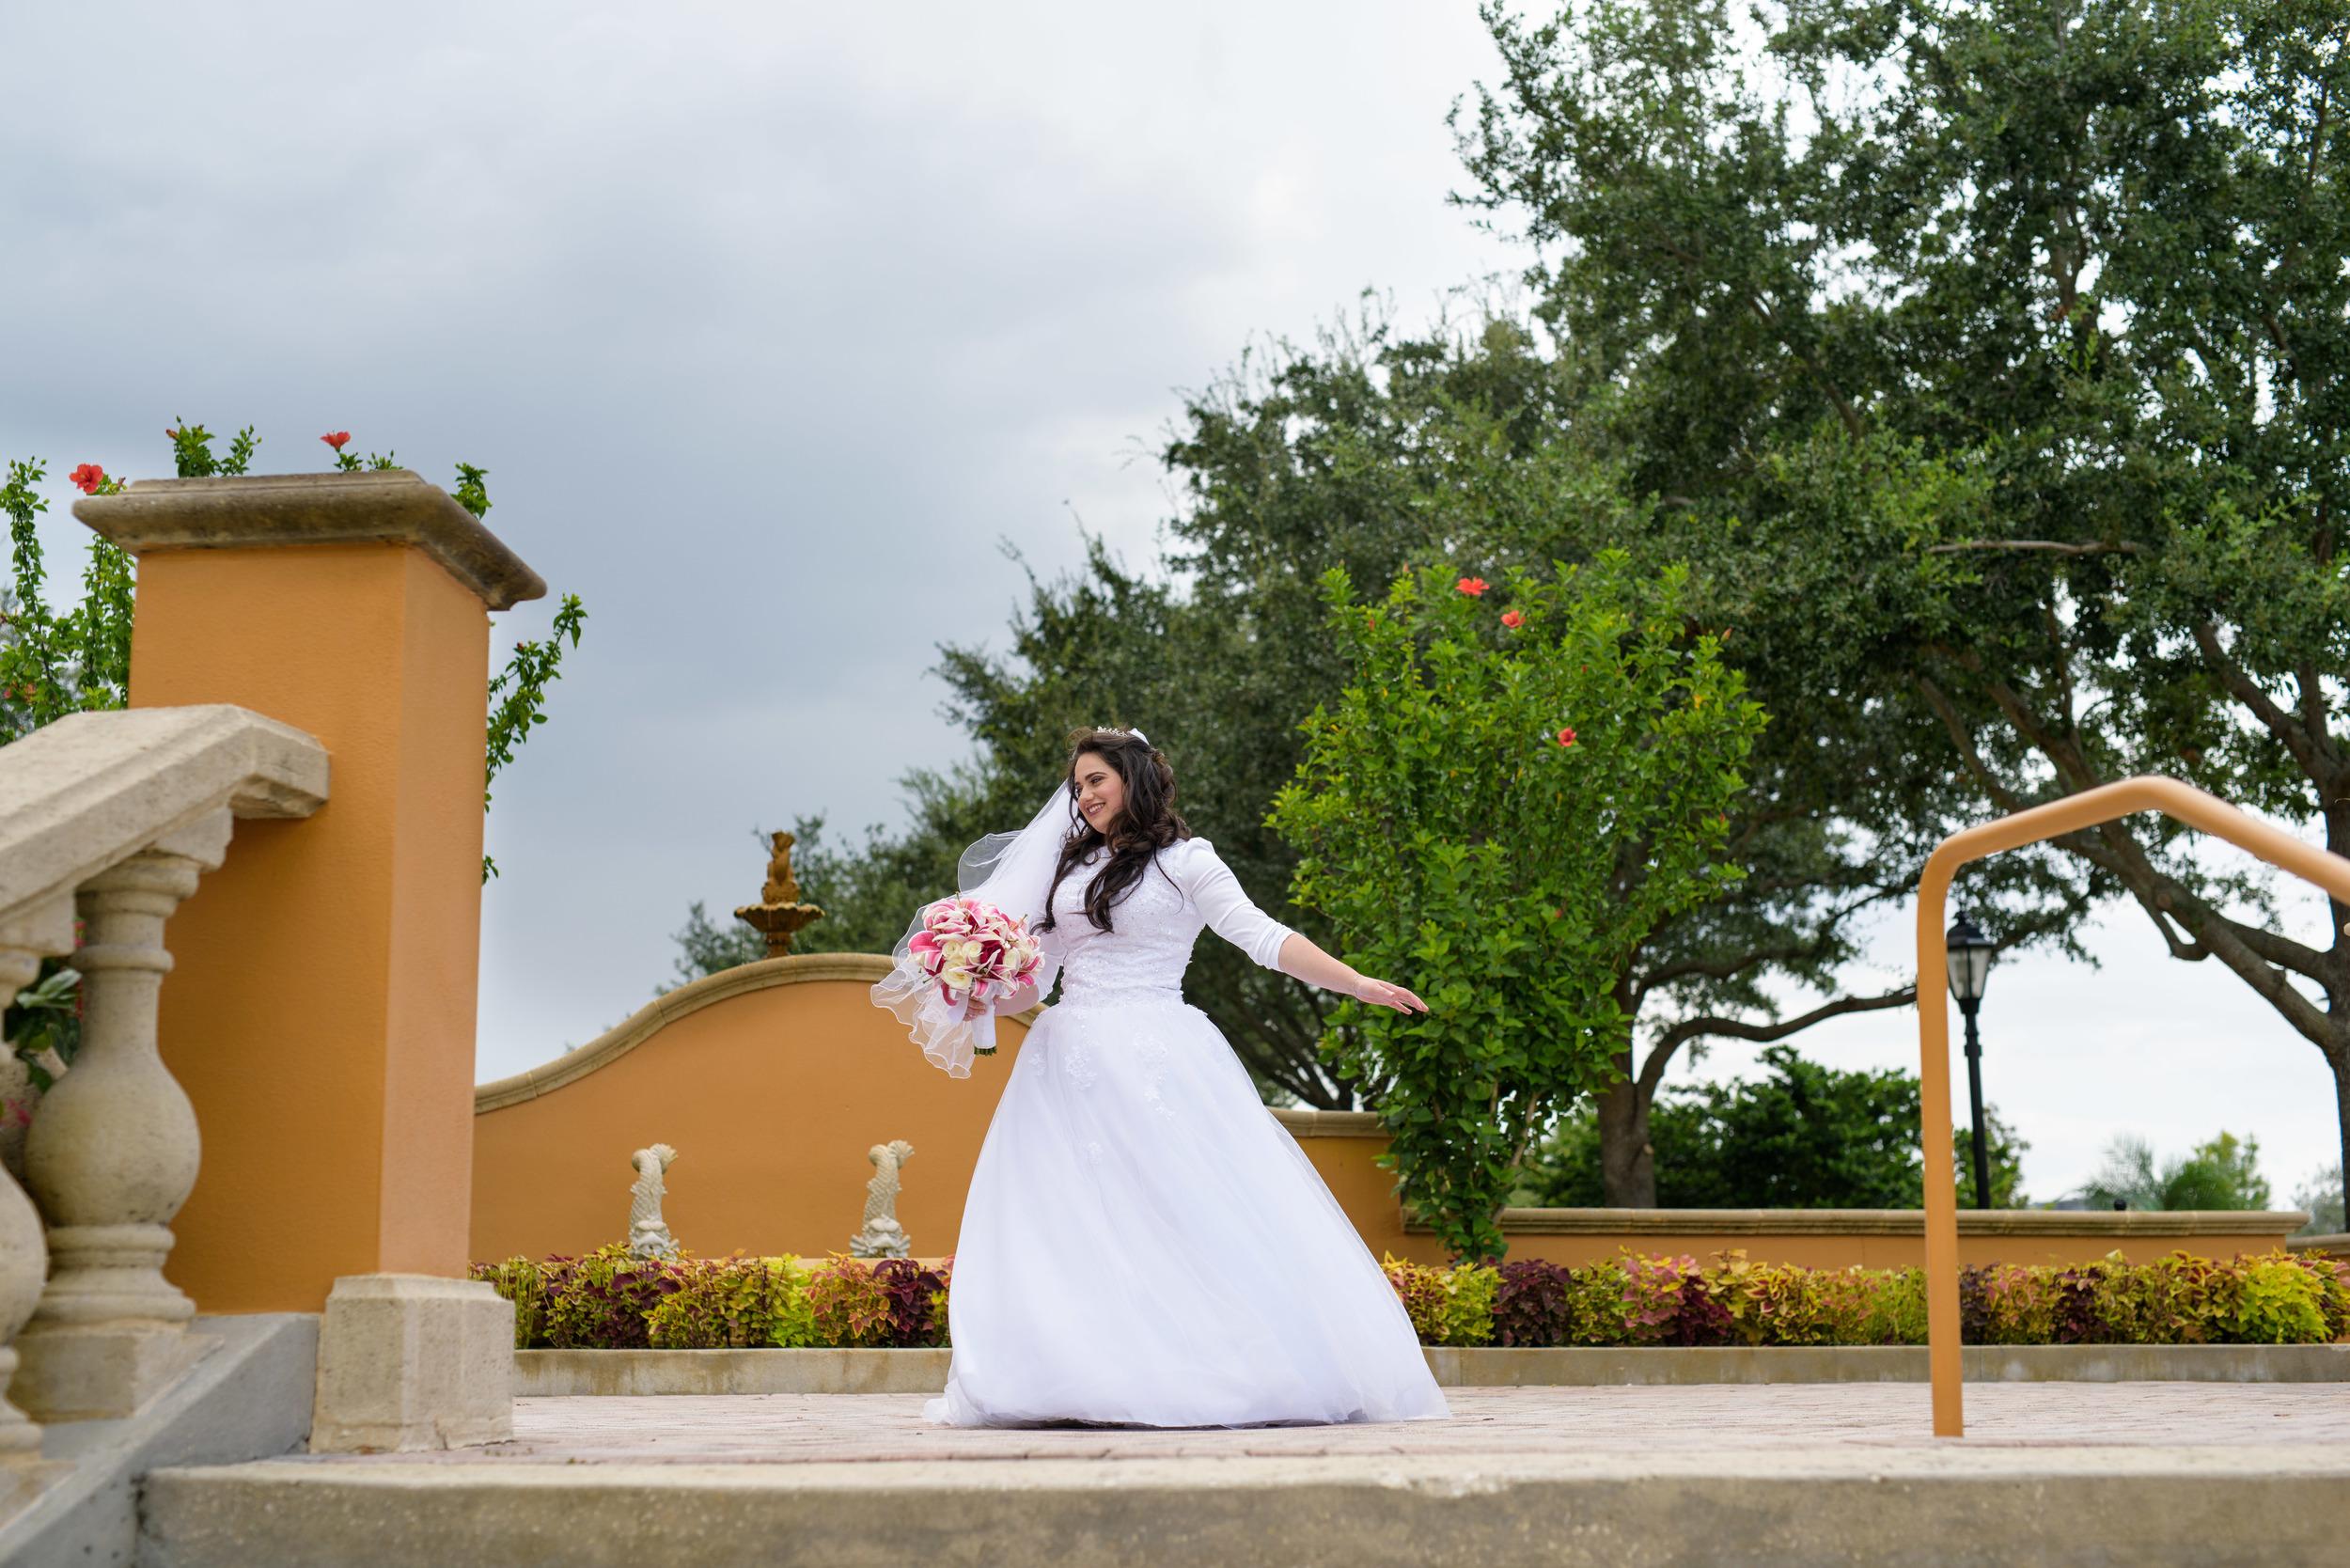 Wedding by Levikfoto.com-068.jpg